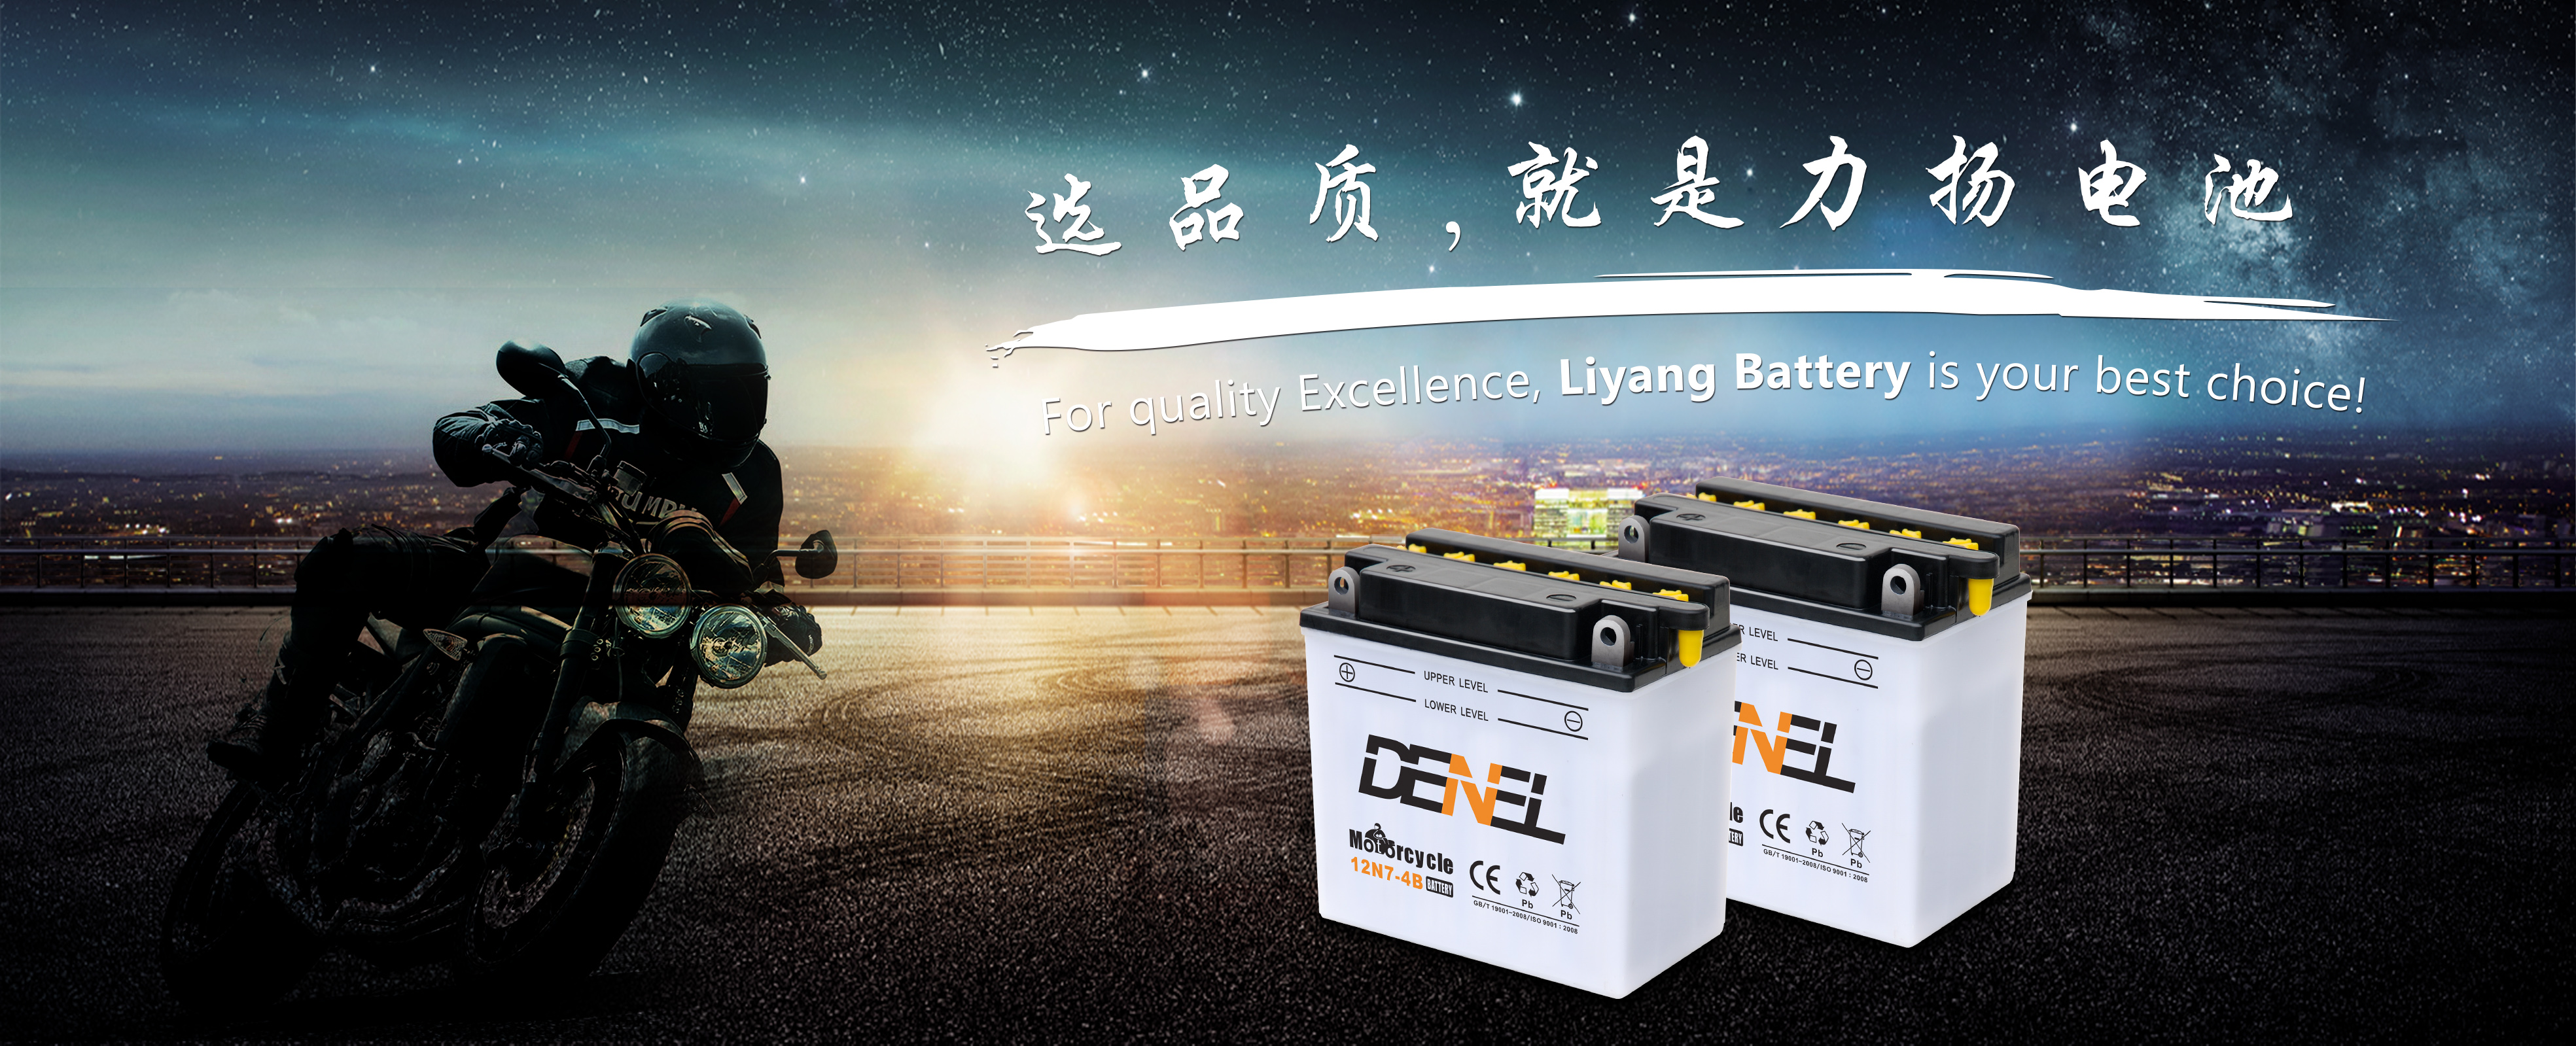 batteries 6-MQA-18 Liyang baterIa de la motocicleta